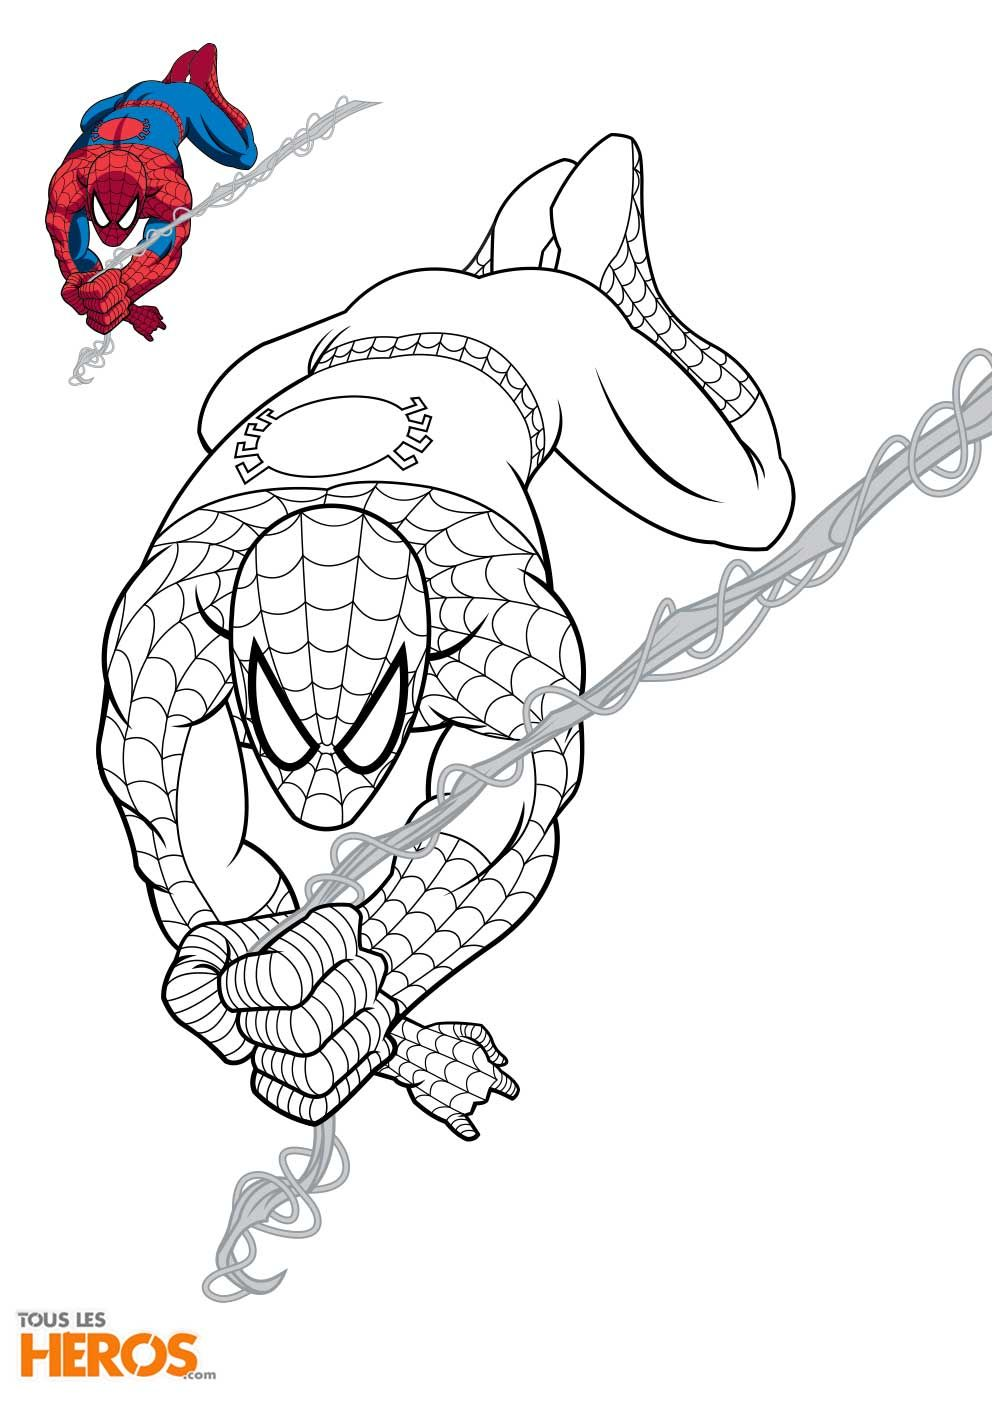 Coloriage spiderman, Dessin spiderman, Coloriage spiderman à imprimer